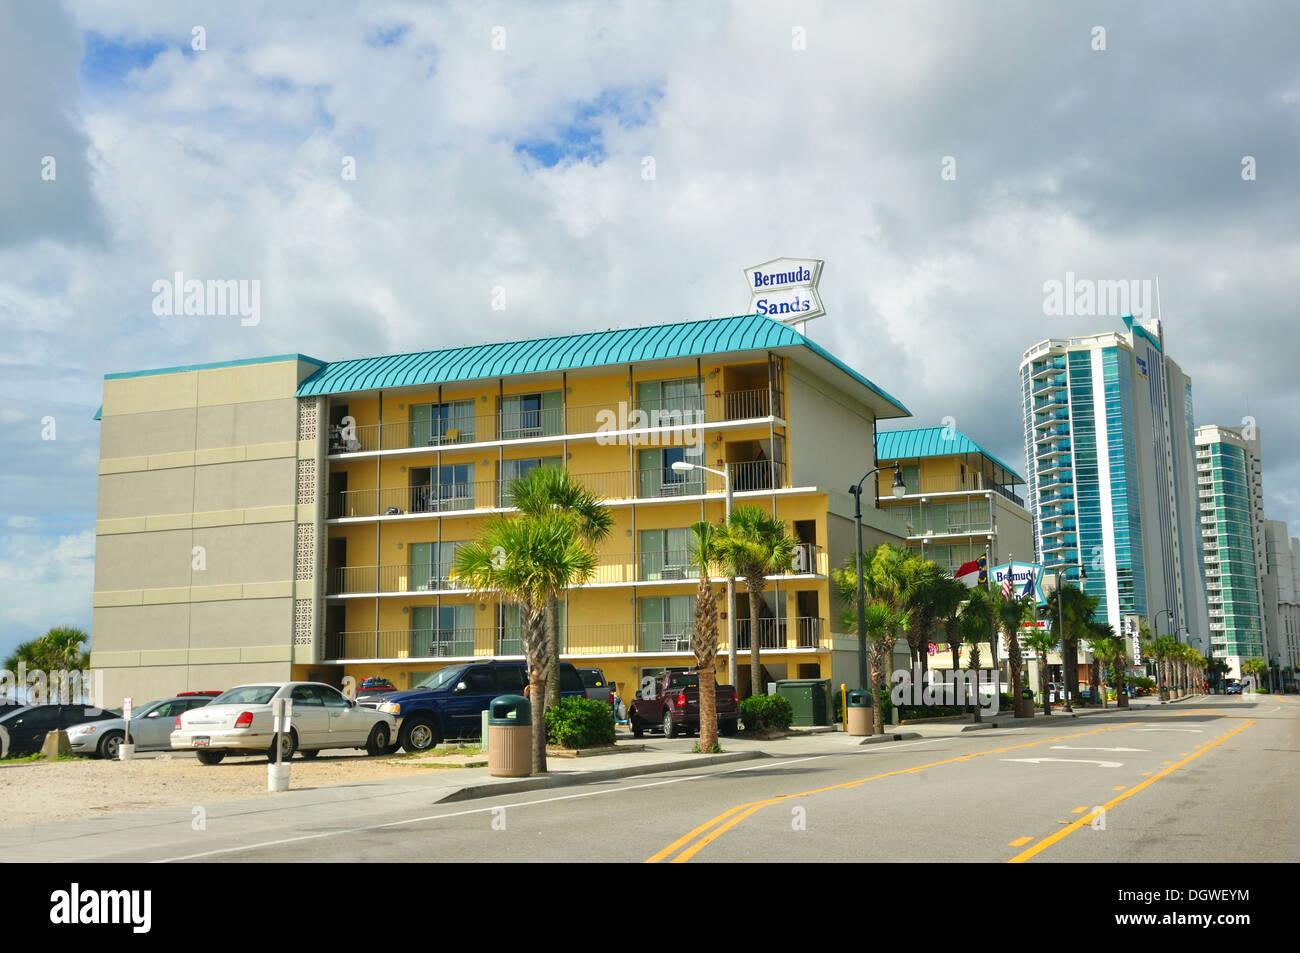 Bermuda Sands Beach Hotel Myrtle South Carolina USA